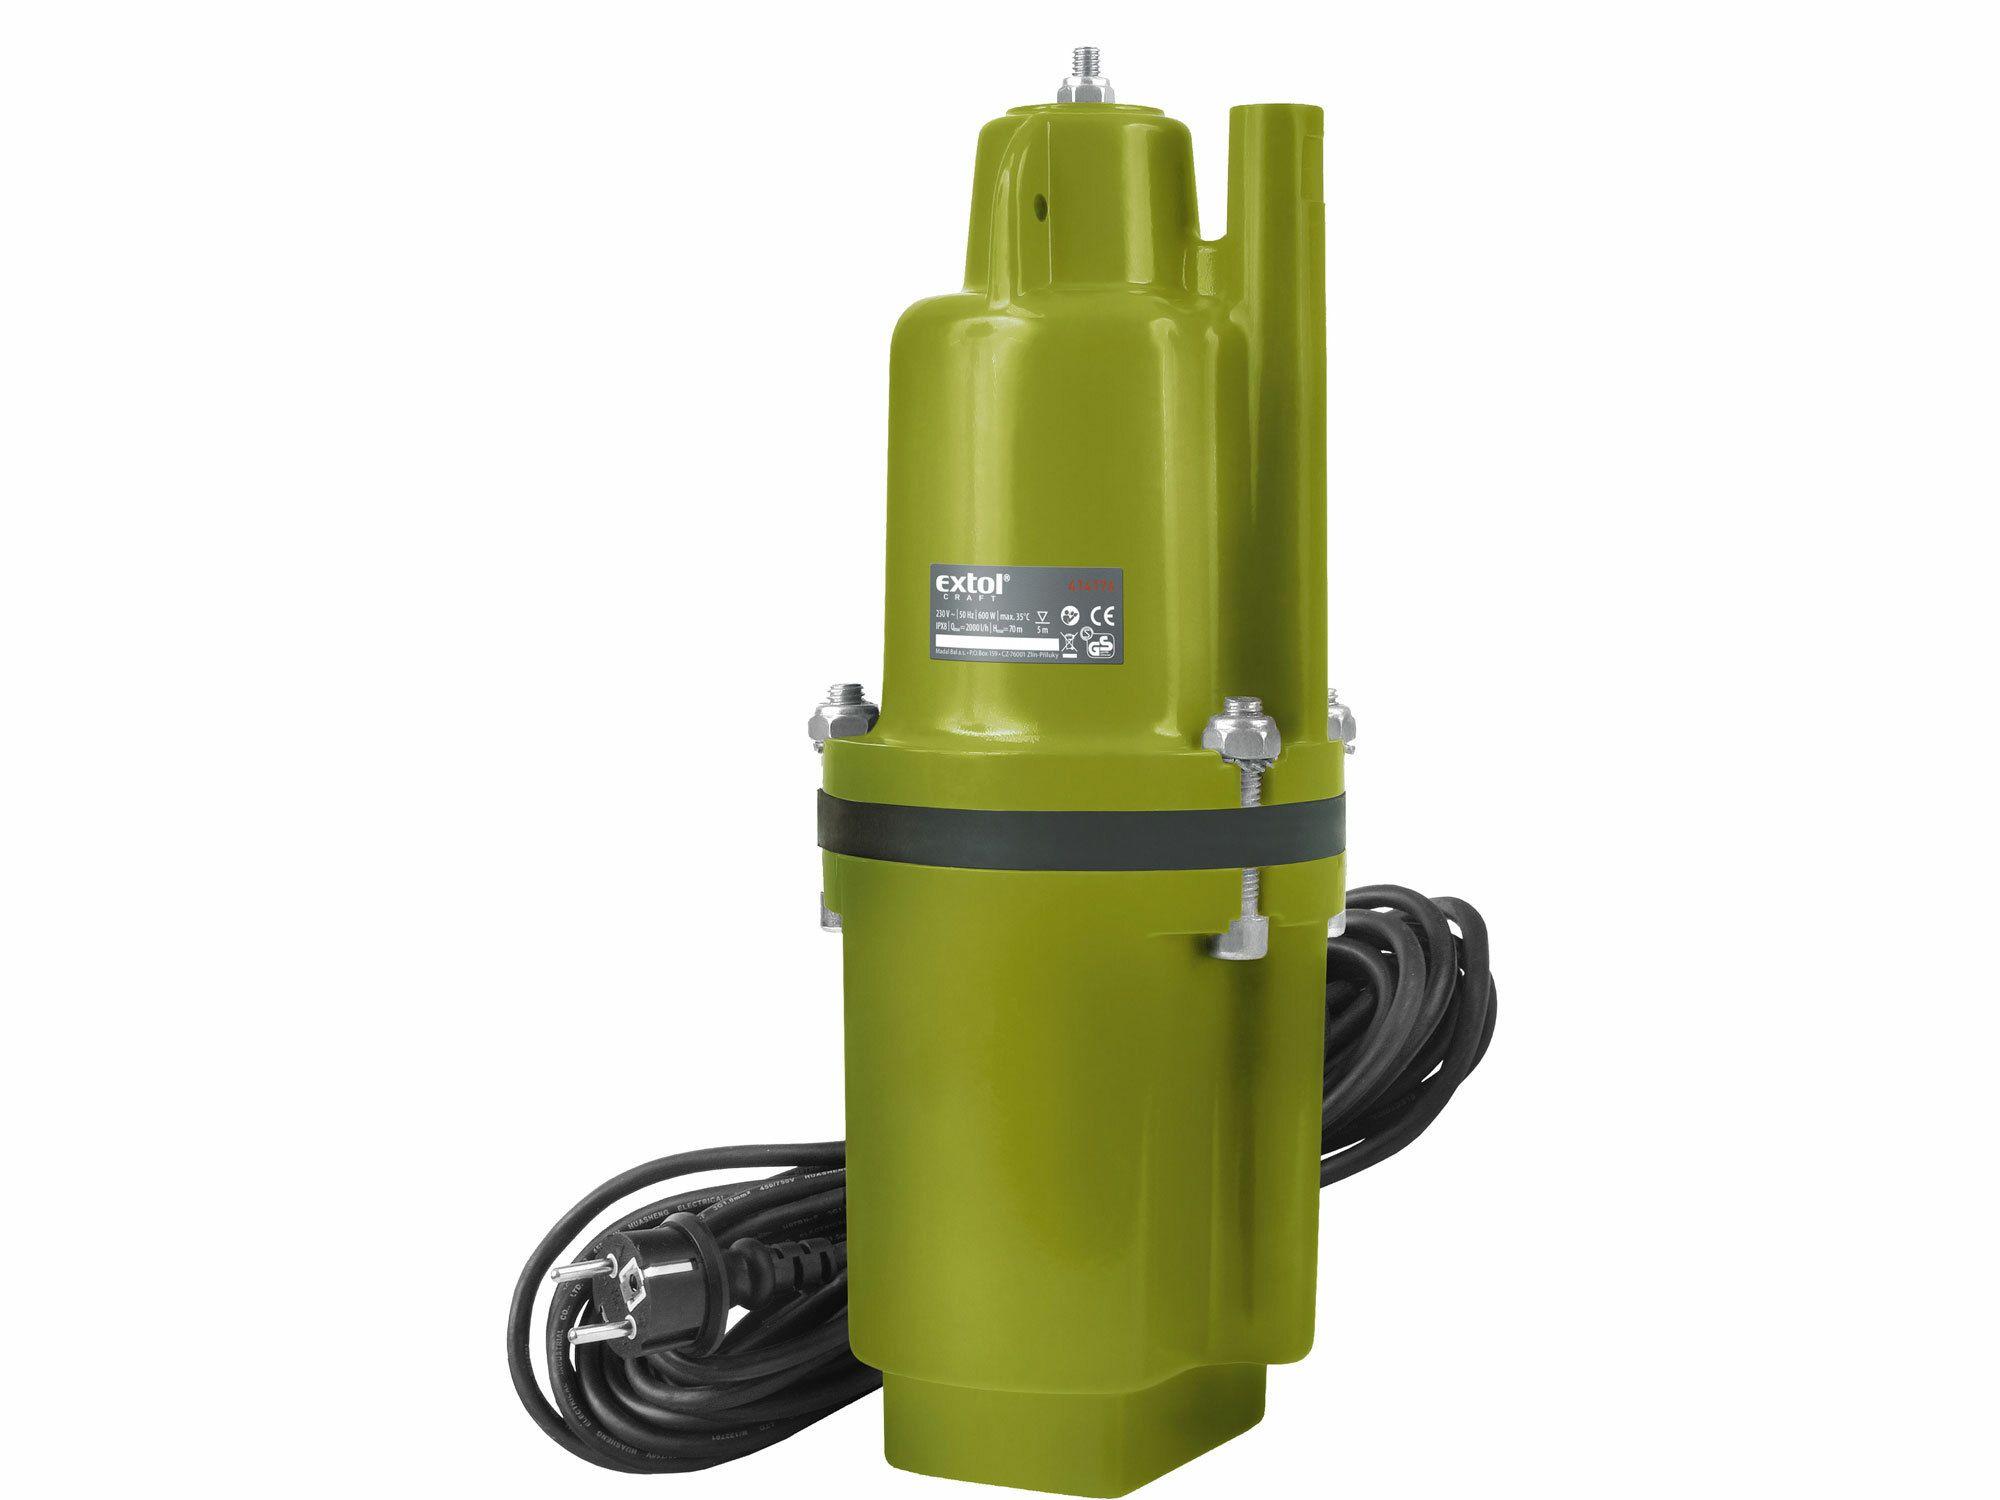 Čerpadlo membránové hlbinné ponorné, 600W, 2000l/hod, 20m, EXTOL CRAFT, 414176